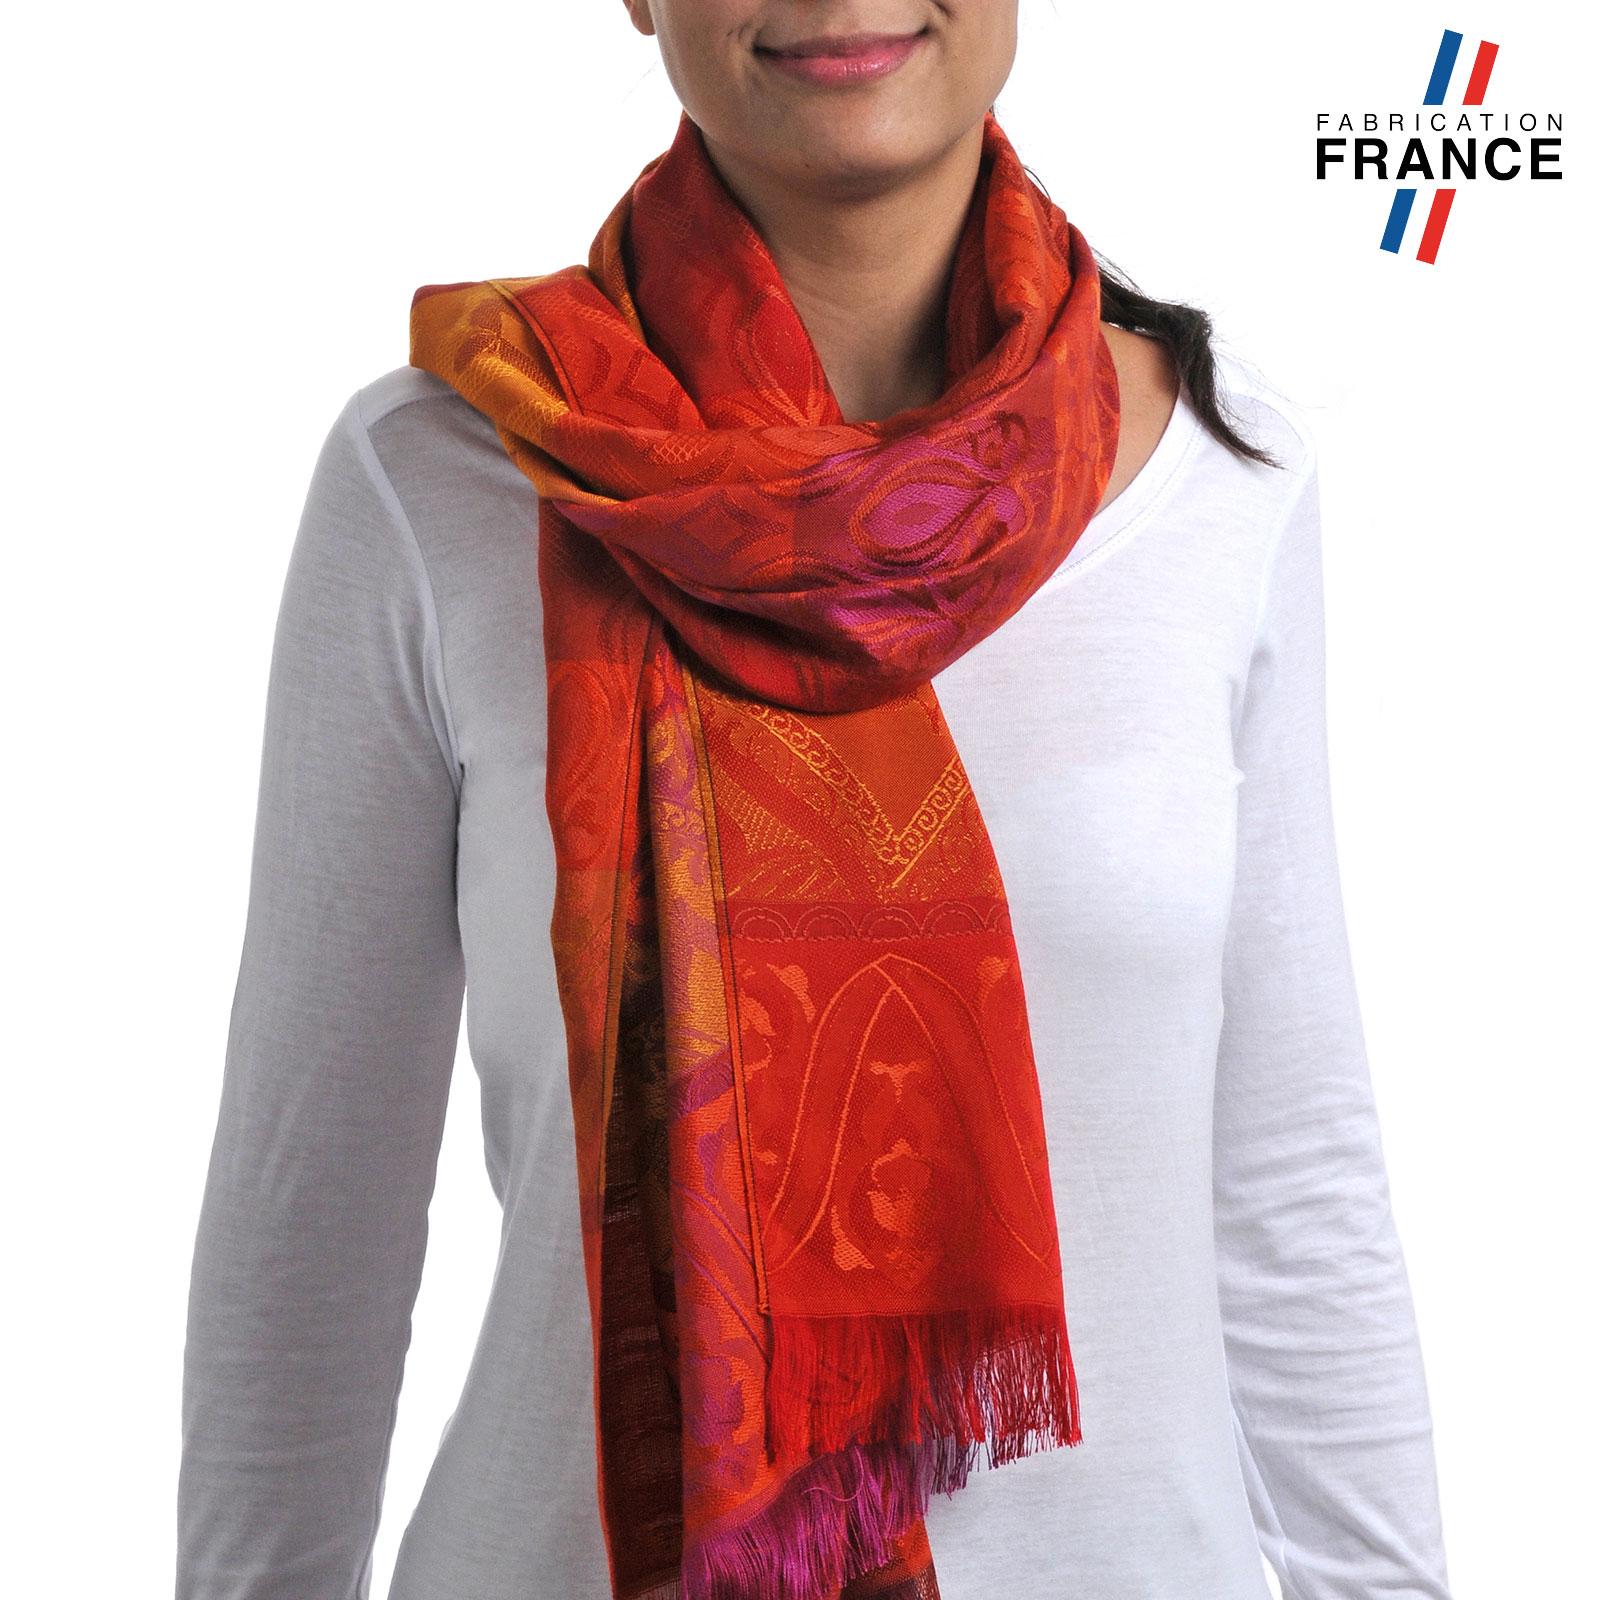 AT-04171-VF16-T-LB_FR-echarpe-mi-saison-orange-rouge